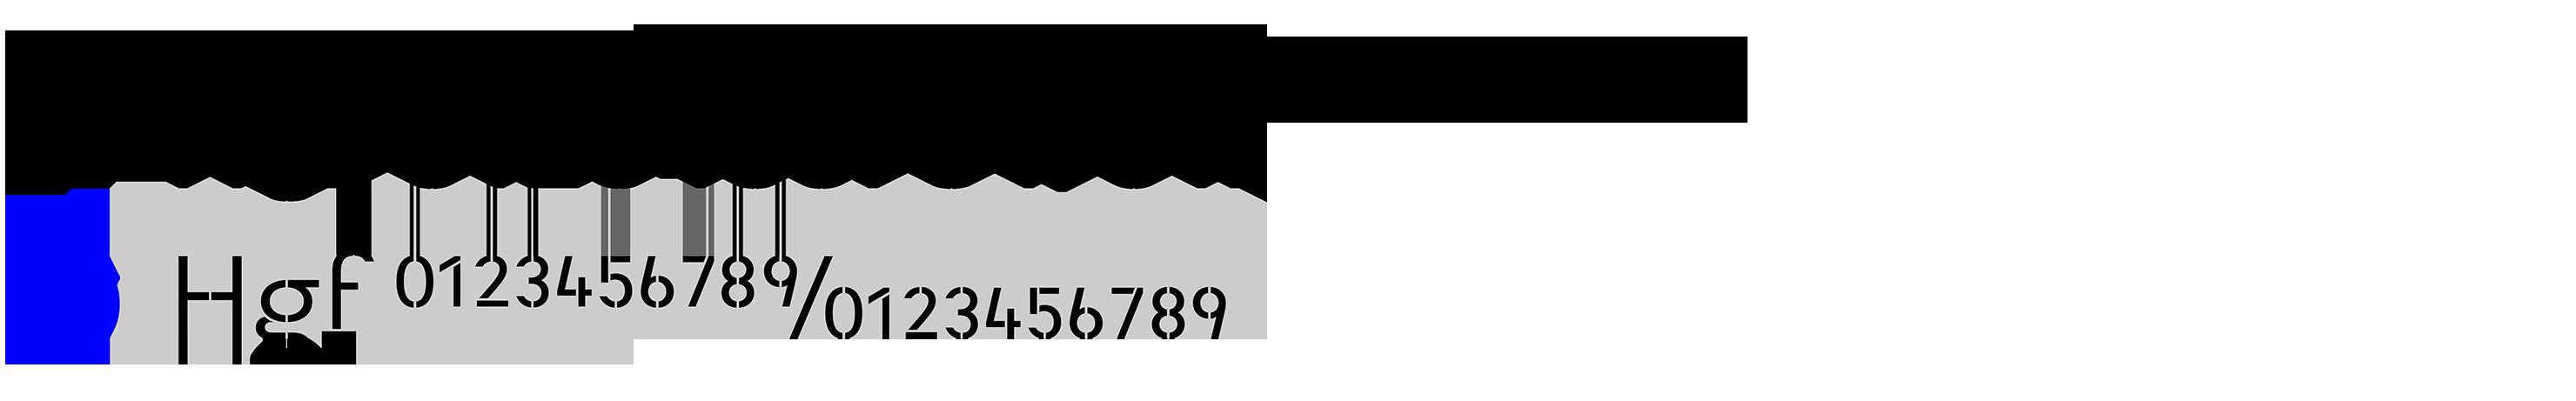 Typeface-Heimat-Stencil-F14-Atlas-Font-Foundry